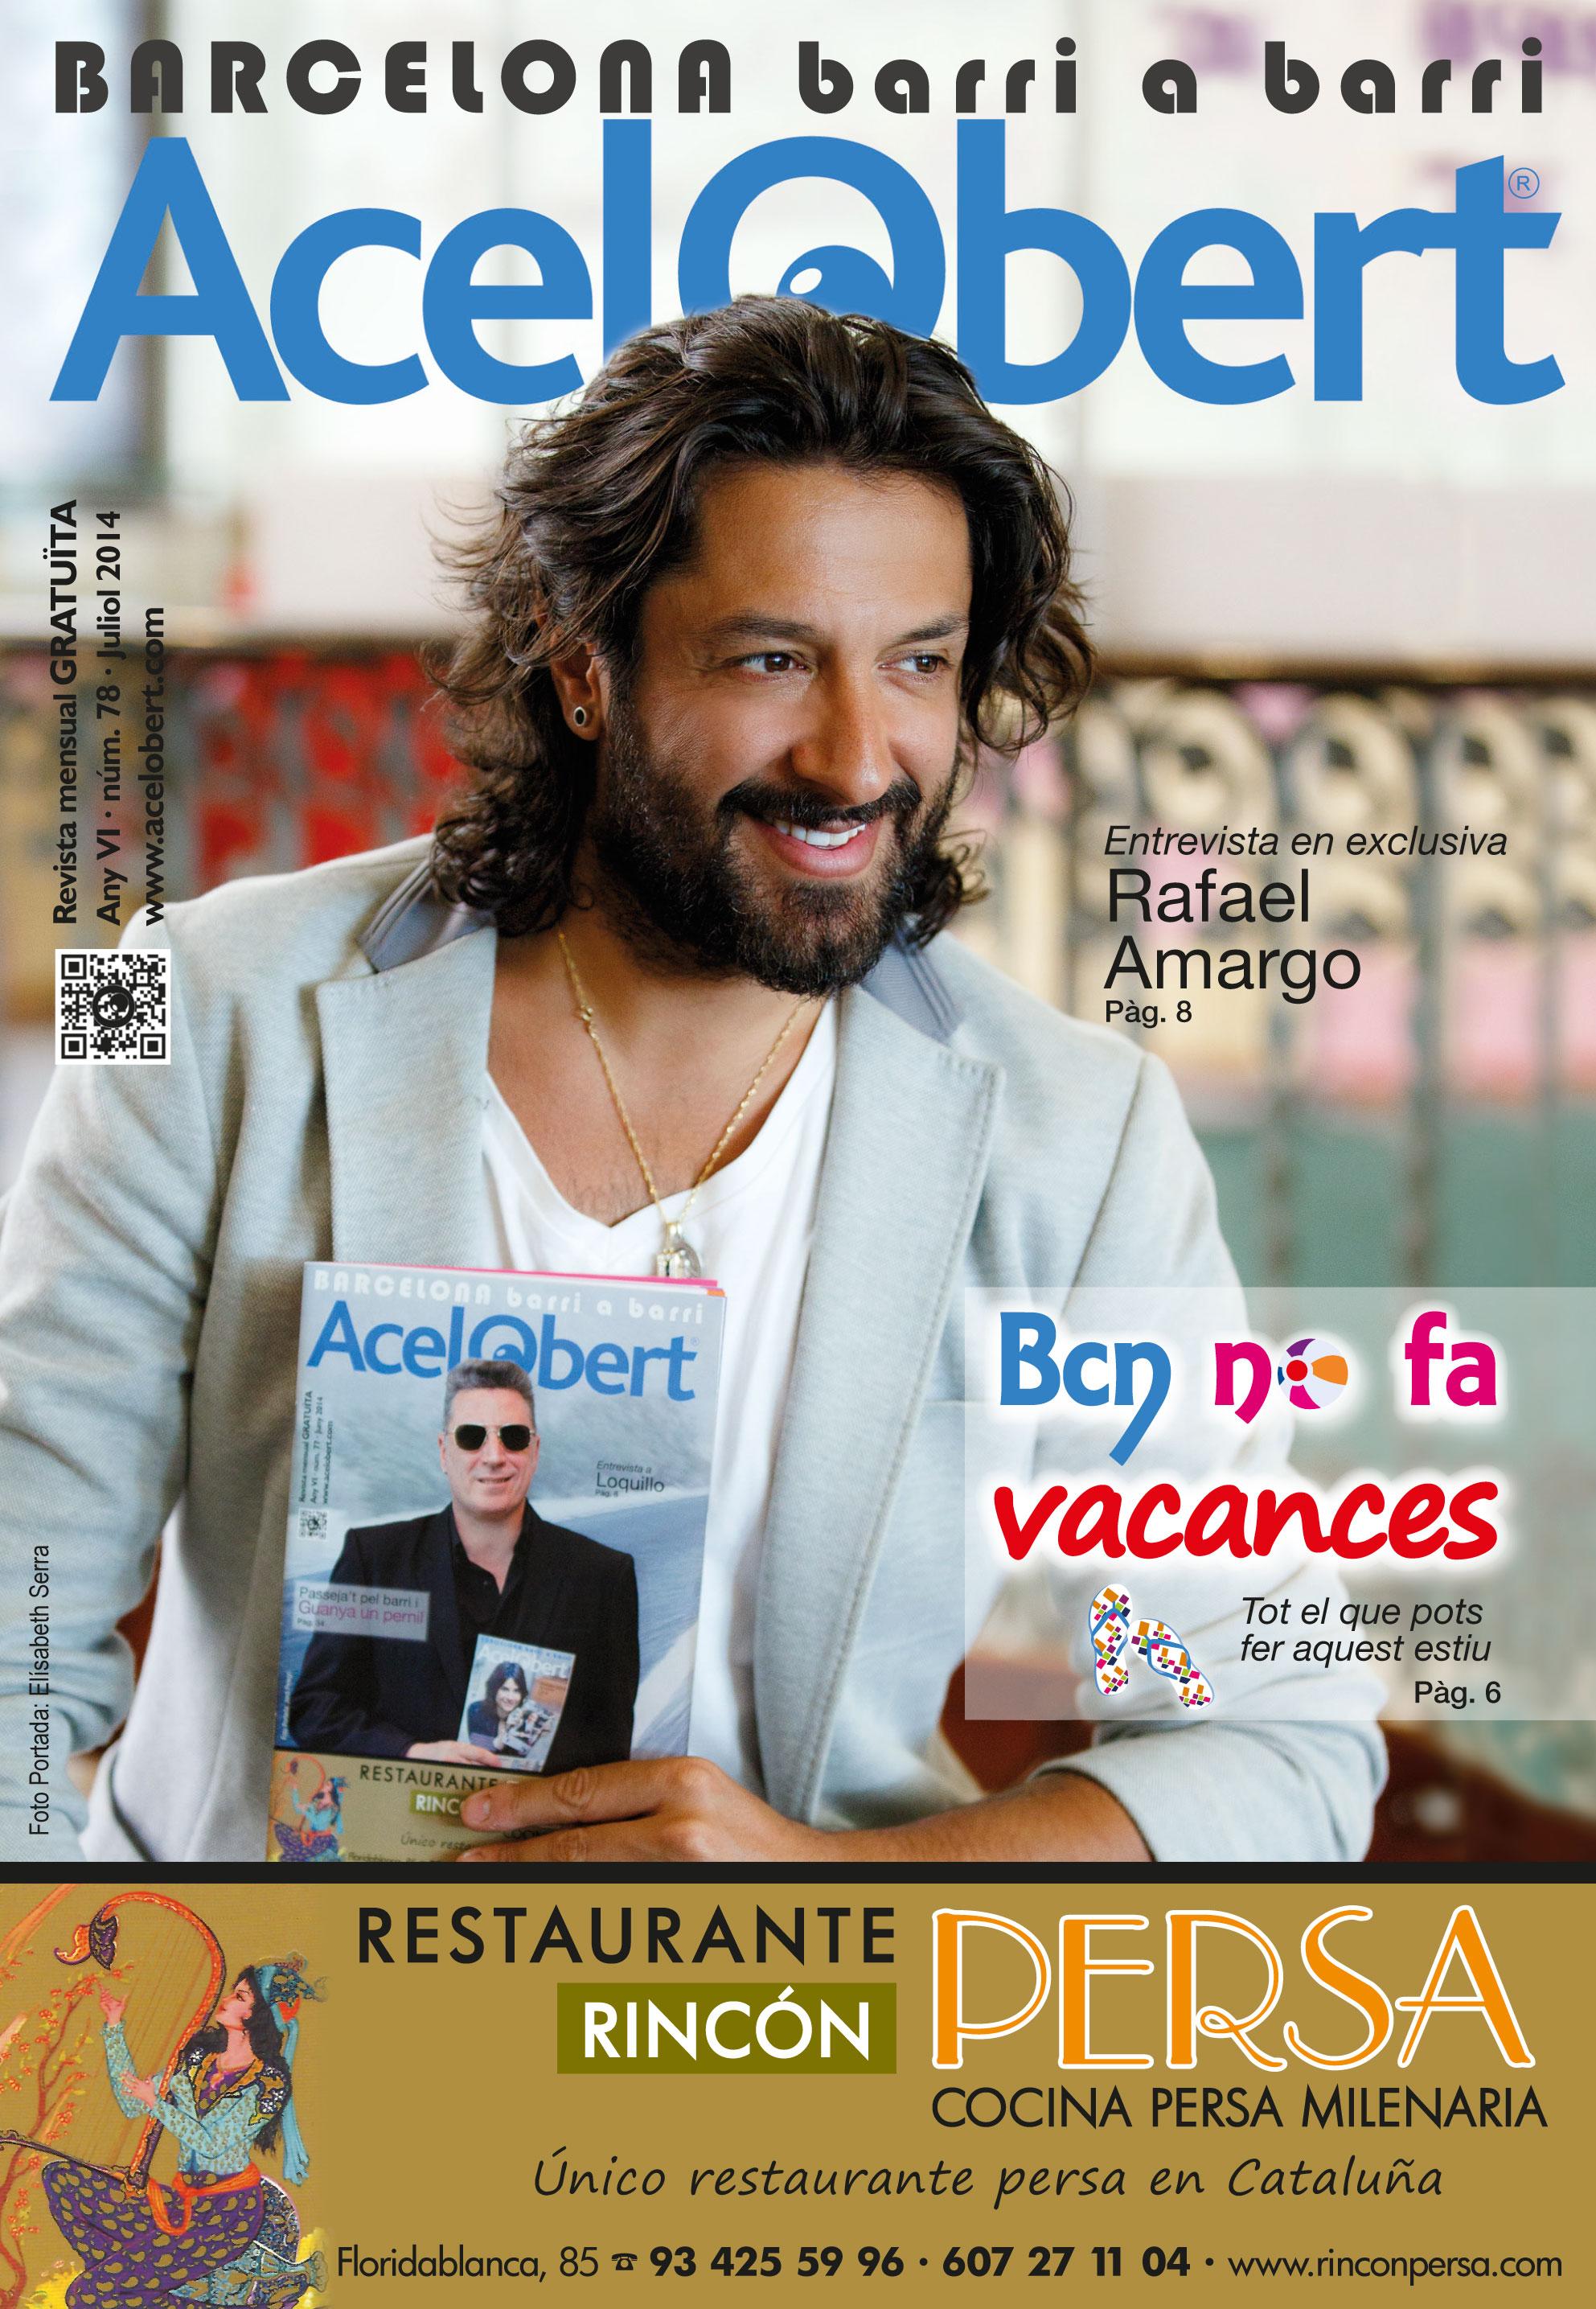 Acelobert Barcelona nº78 Juliol 2014